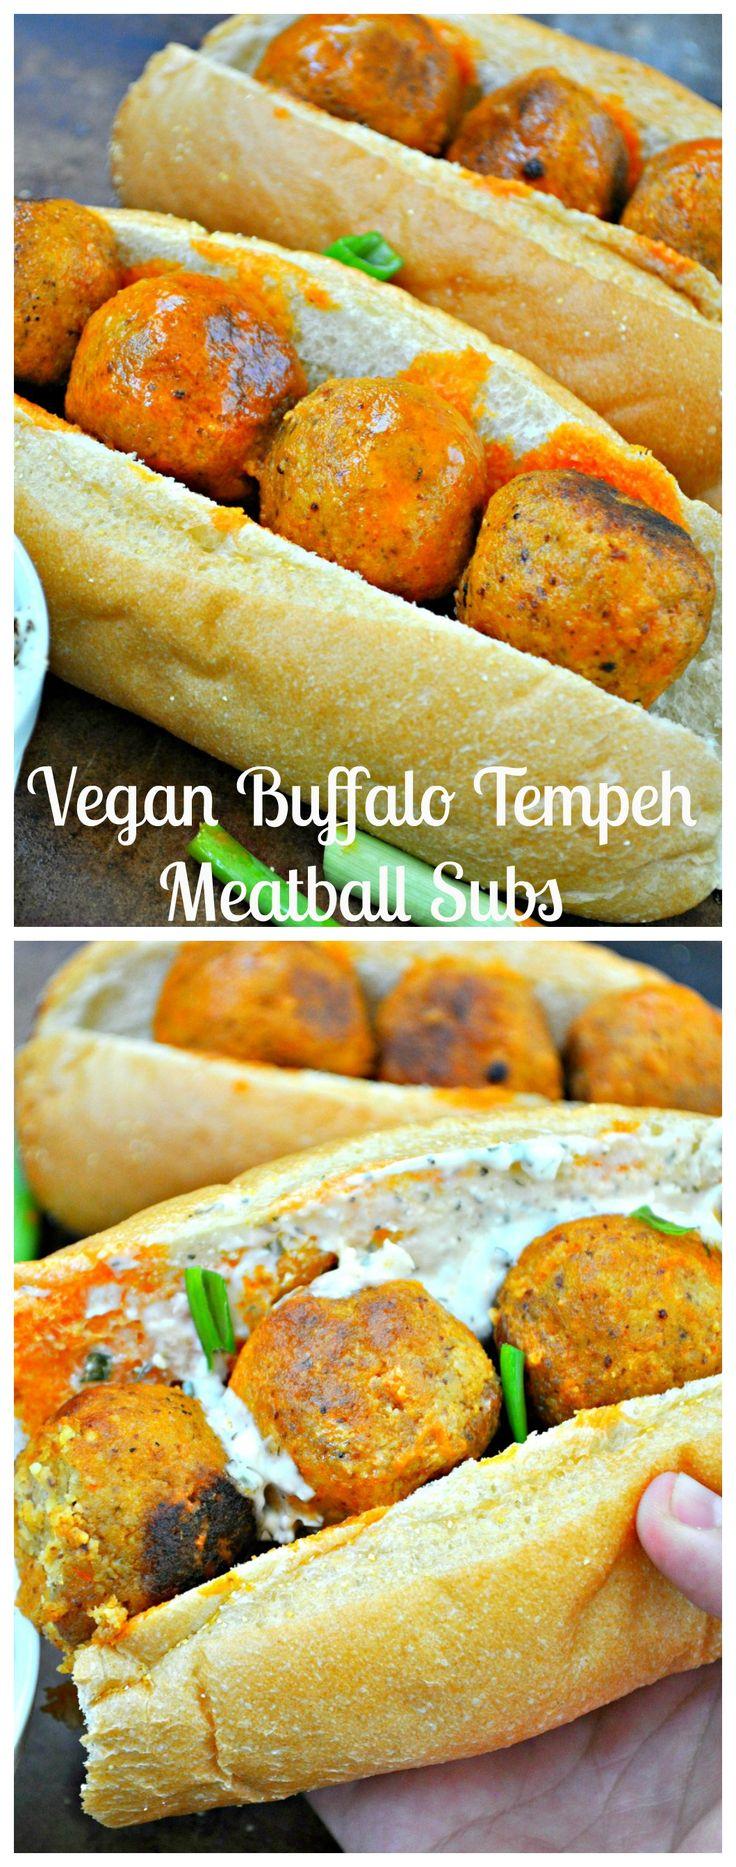 Vegan Buffalo Tempeh Meatball Subs